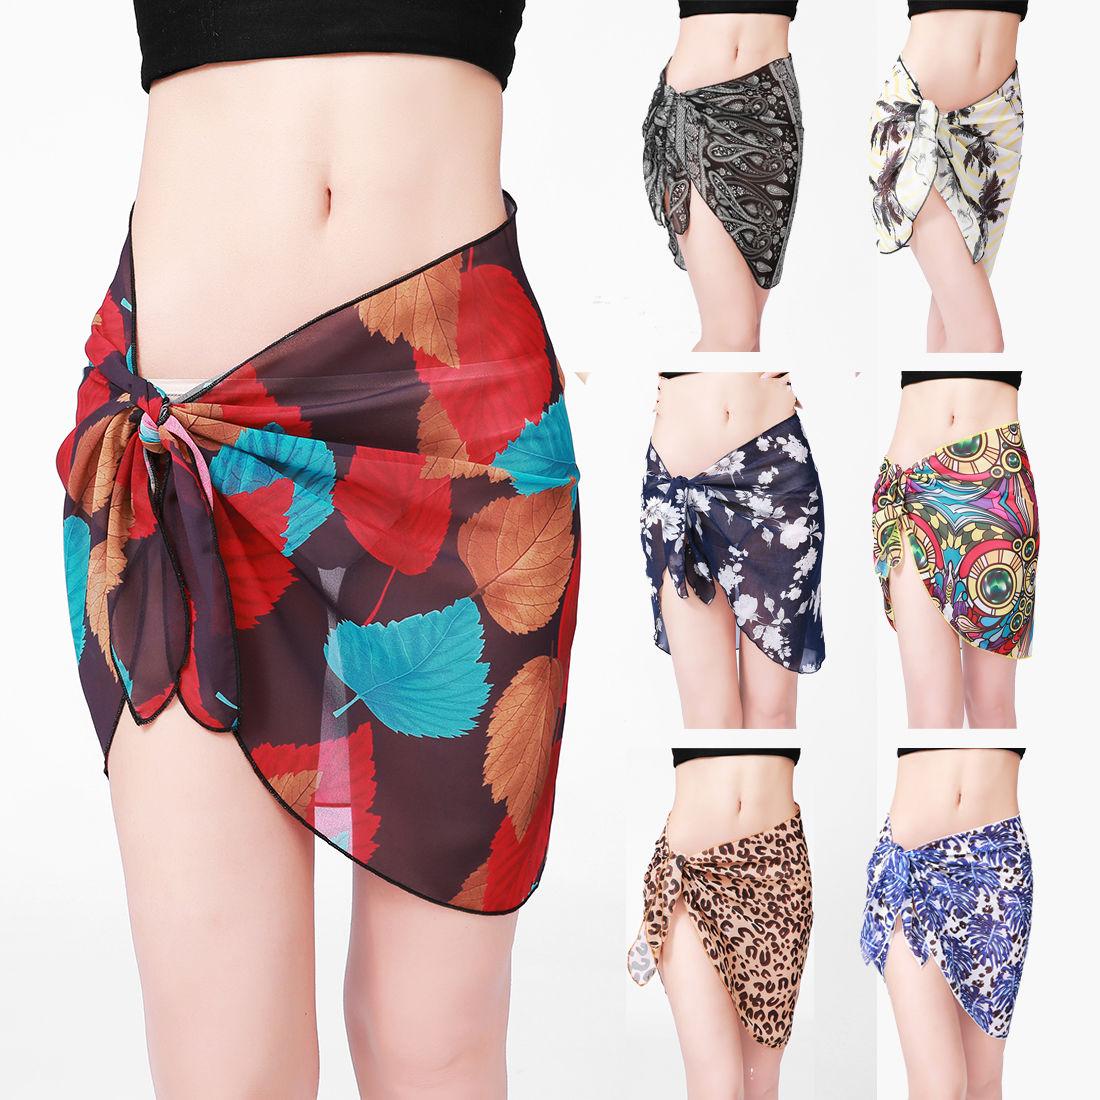 2017 Hot Women Swimwear Cover-Ups Sexy Pareo Chiffon Wrap Beach Sarong Beach Swimwear Bikini Cover-Skirt Print Women Beachwear la blanca women s printed cover ups